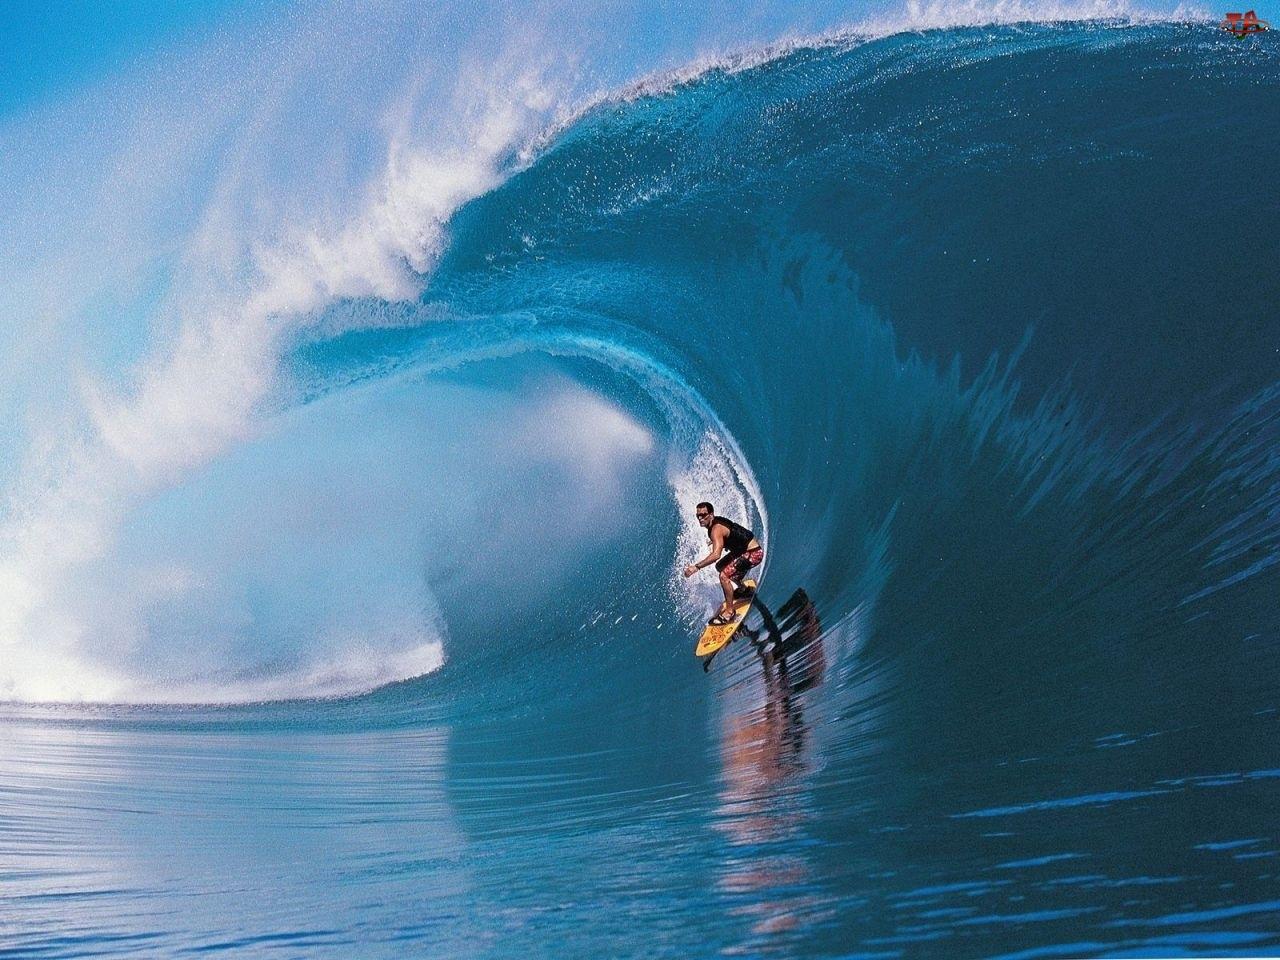 Fala, Surfer